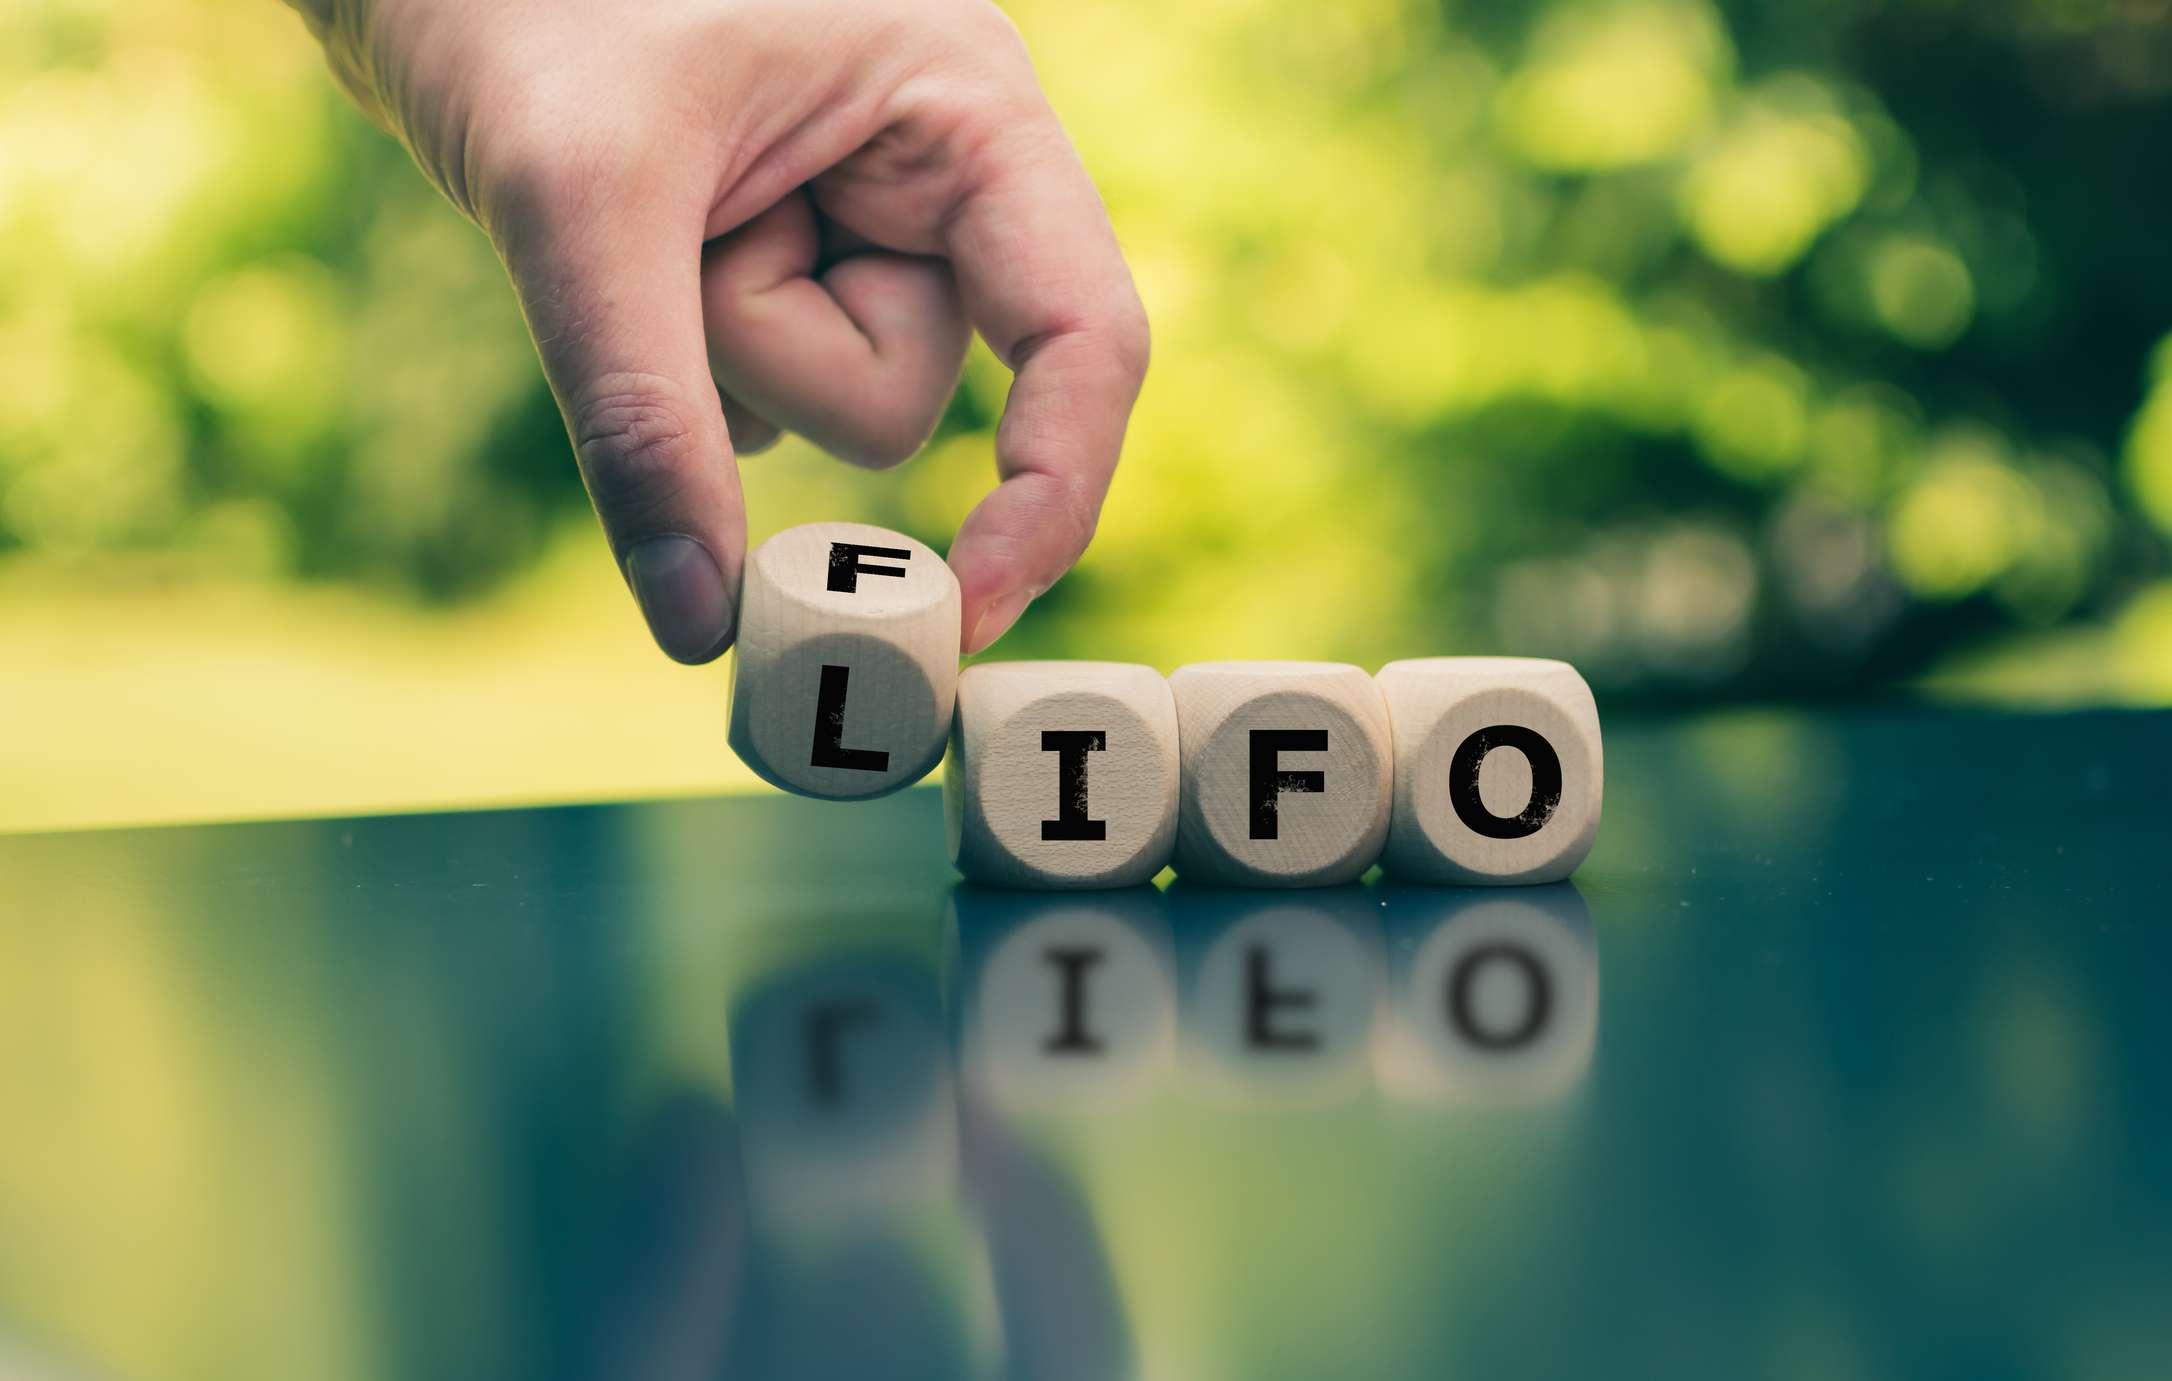 When & Why Should a Company Use LIFO